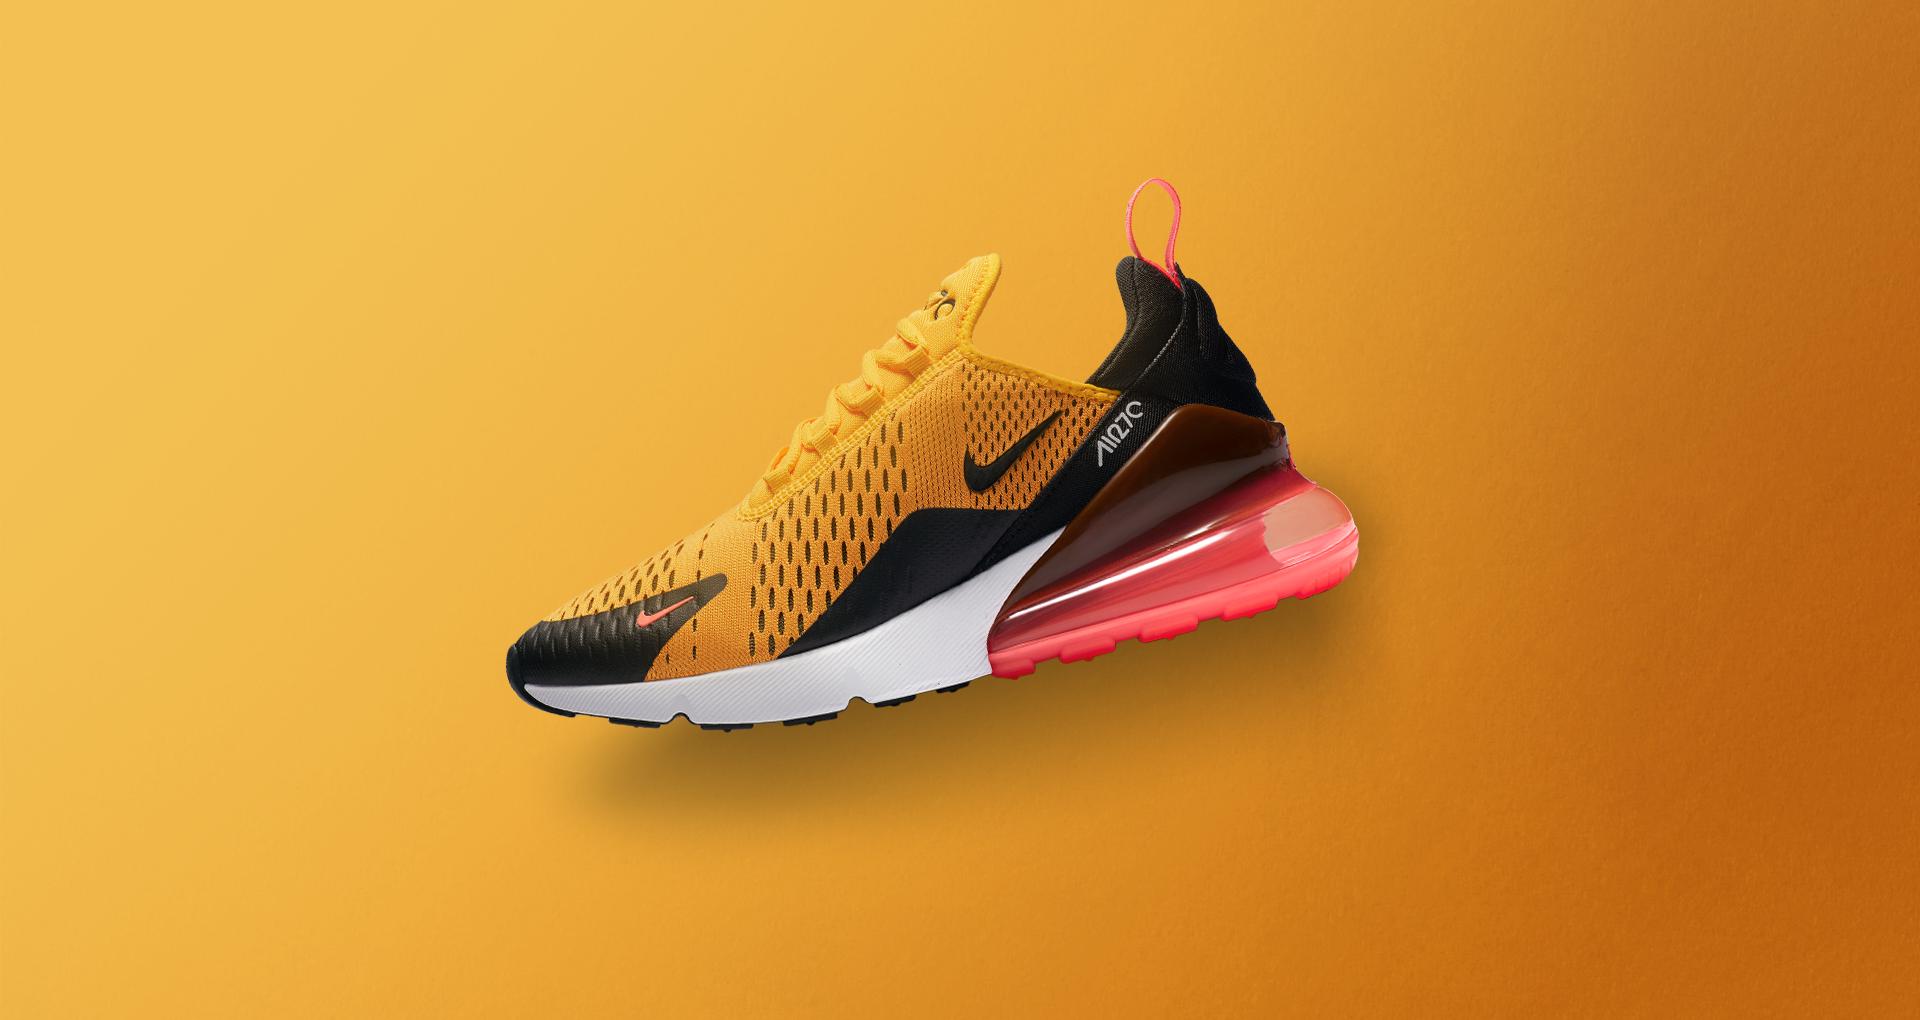 2018 shoes wholesale new concept Nike Air Max 270 Black University Gold